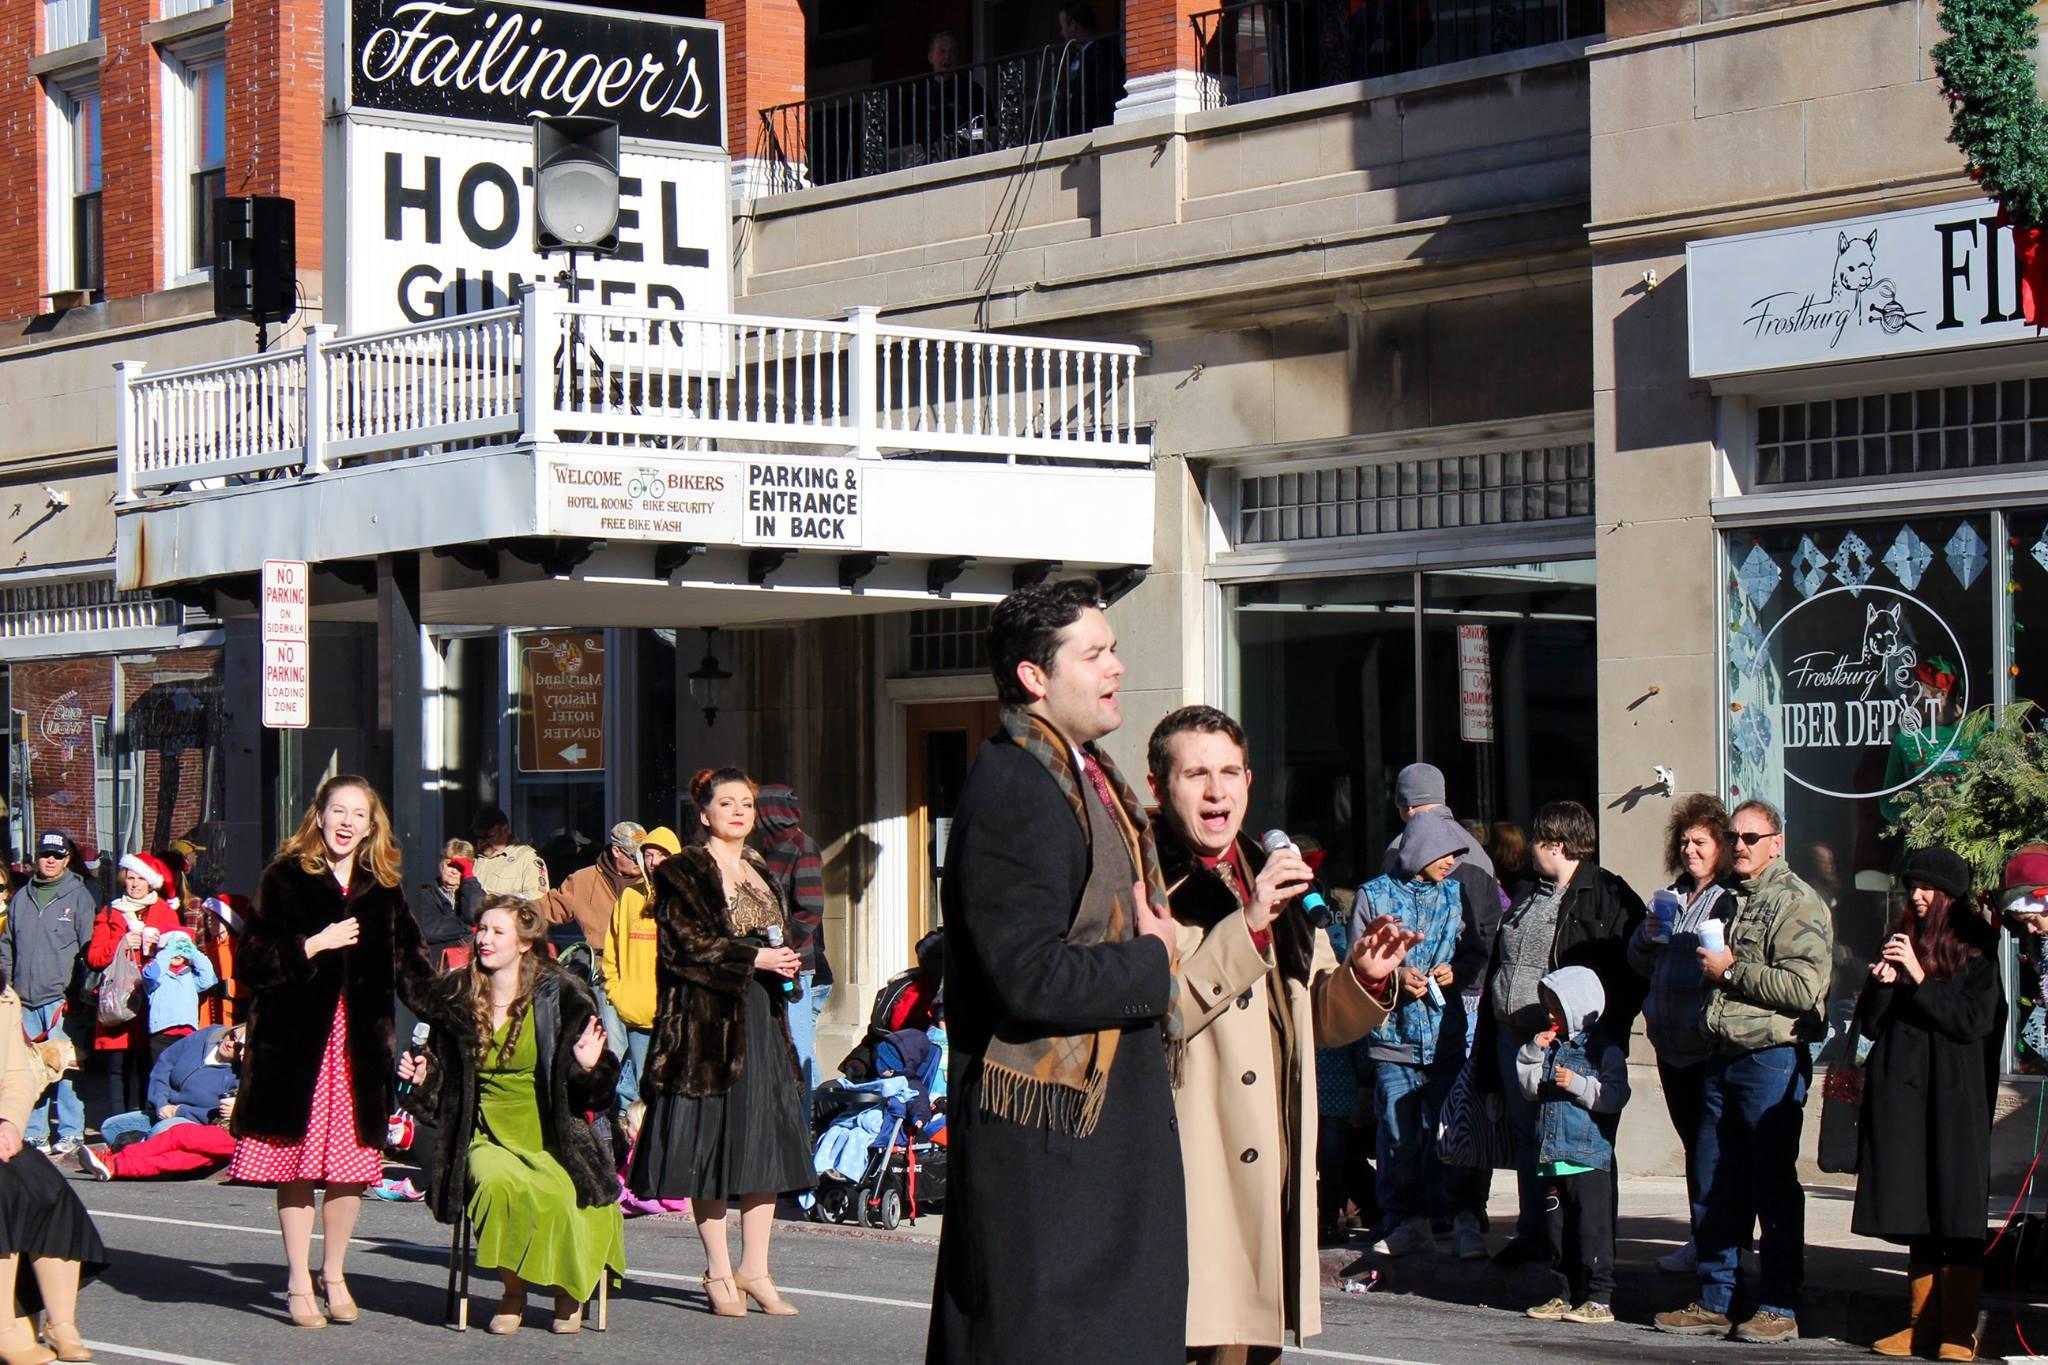 Storybook Holiday – Downtown Frostburg Throughout Frostburg School Calendar